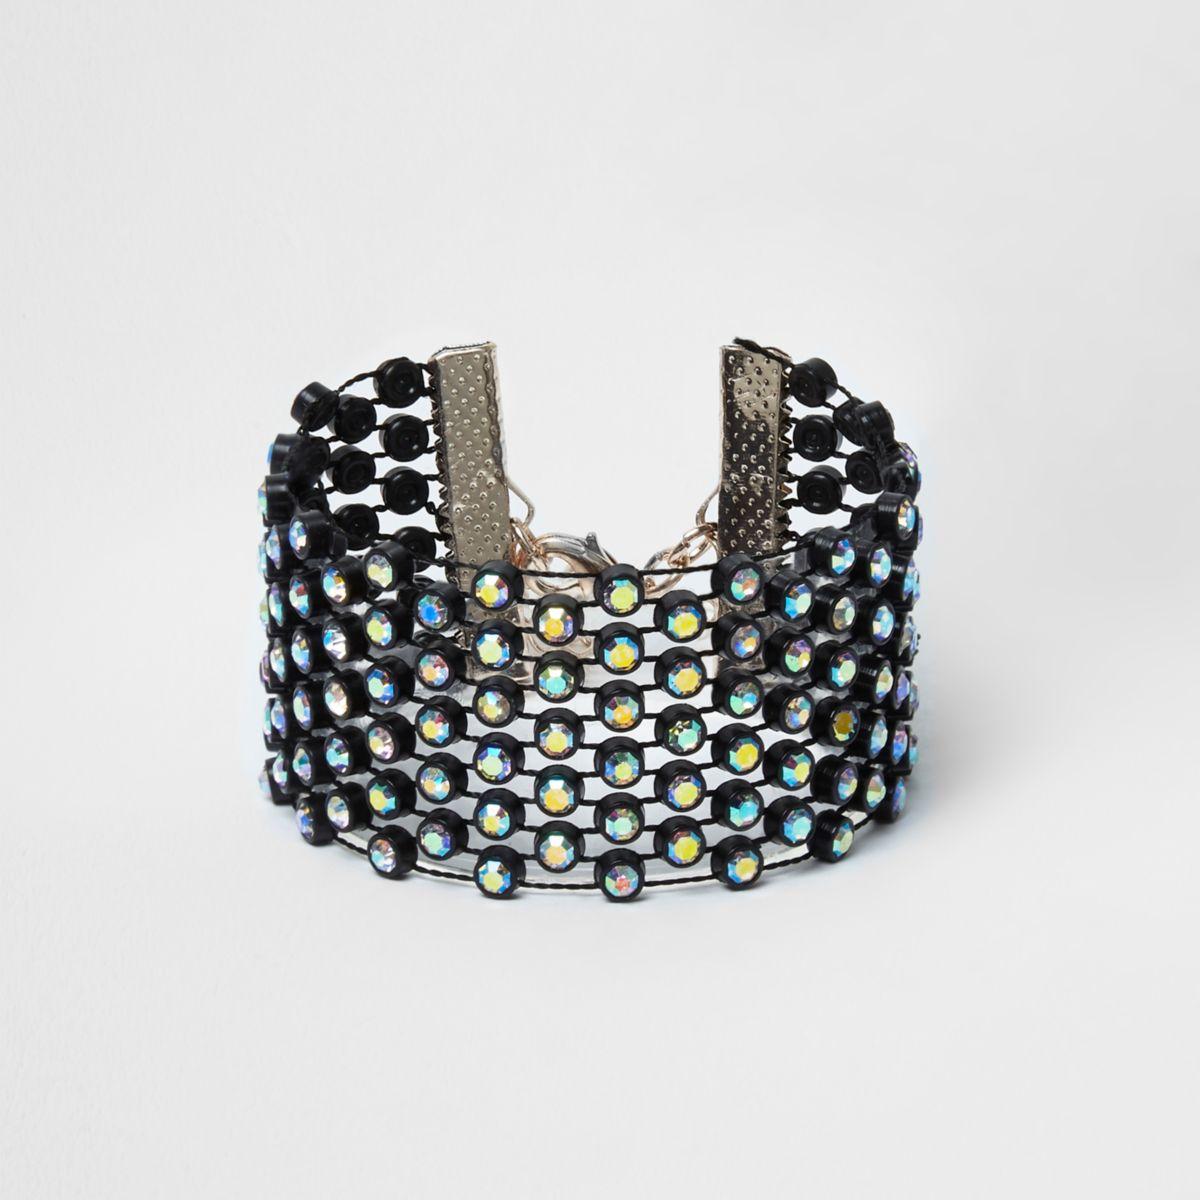 Black diamante threaded bracelet